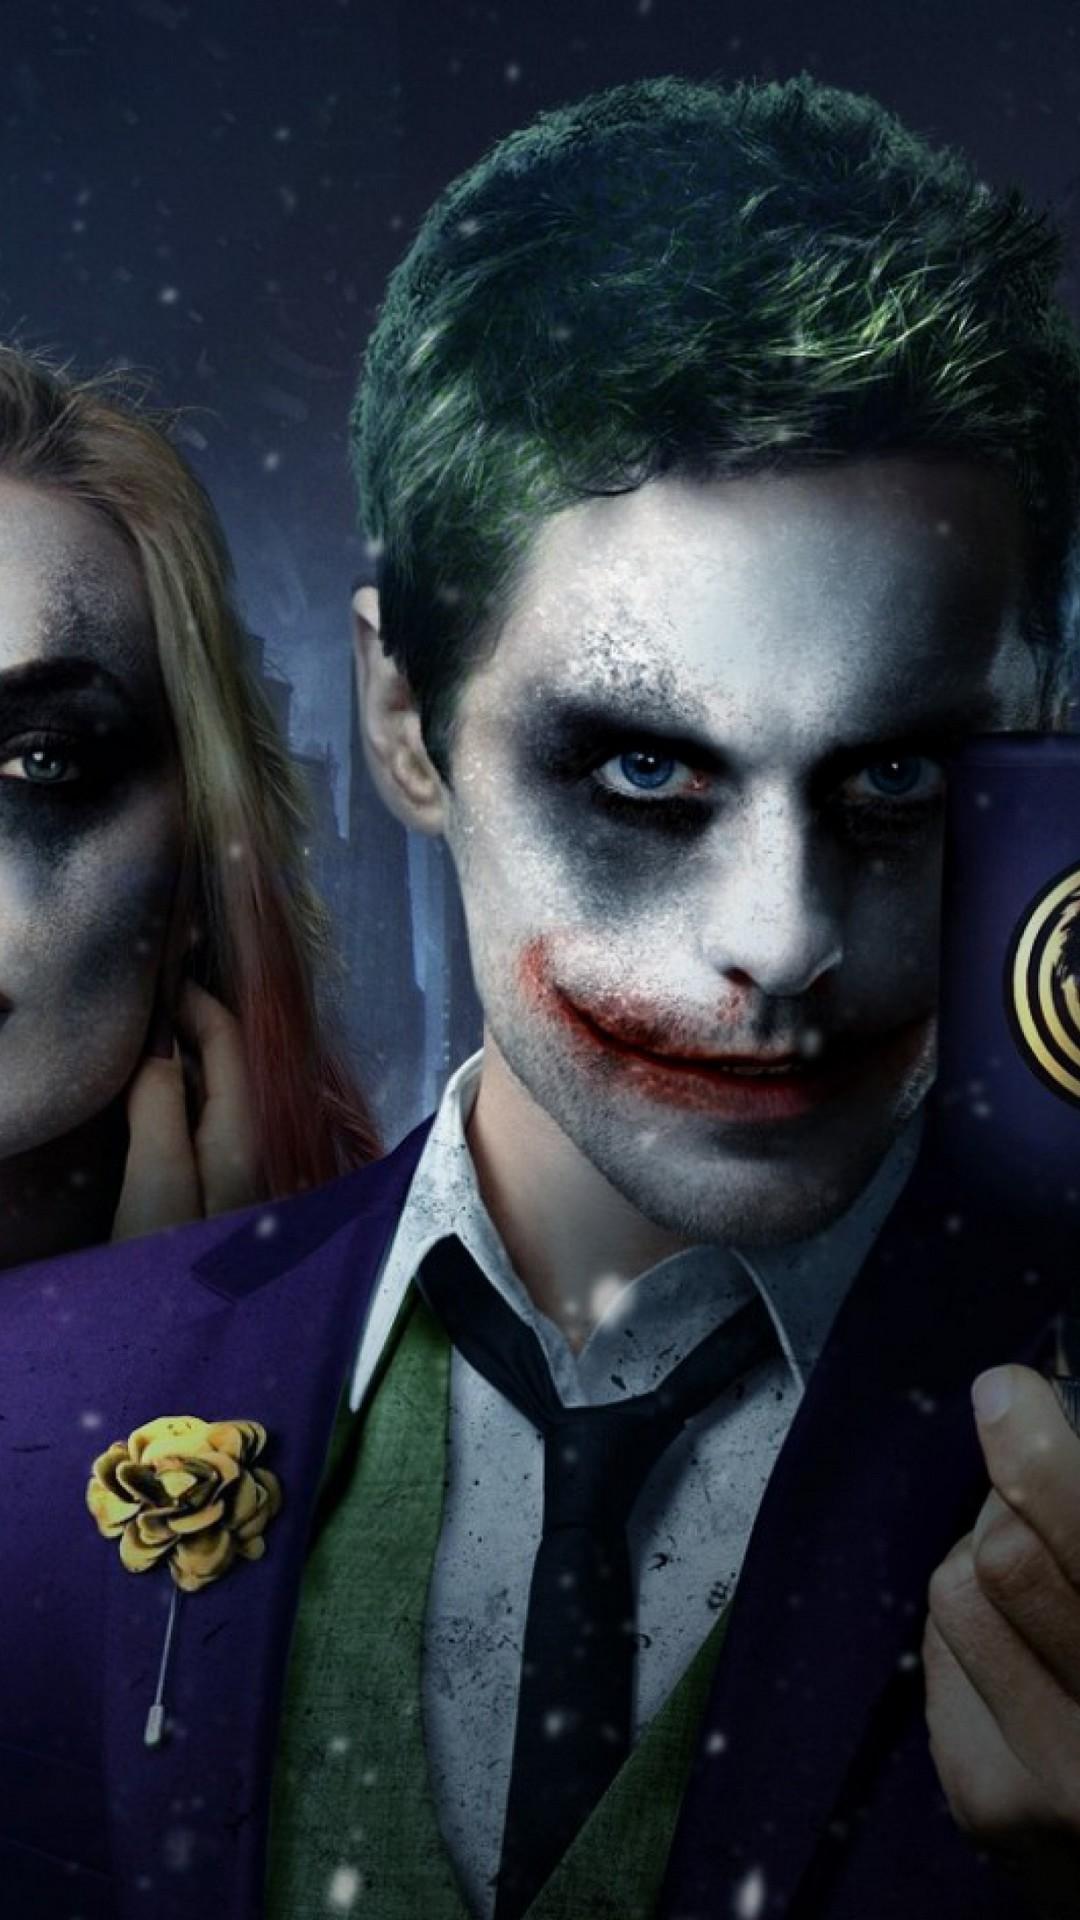 The Joker Wallpaper Iphone Posted By Christopher Peltier